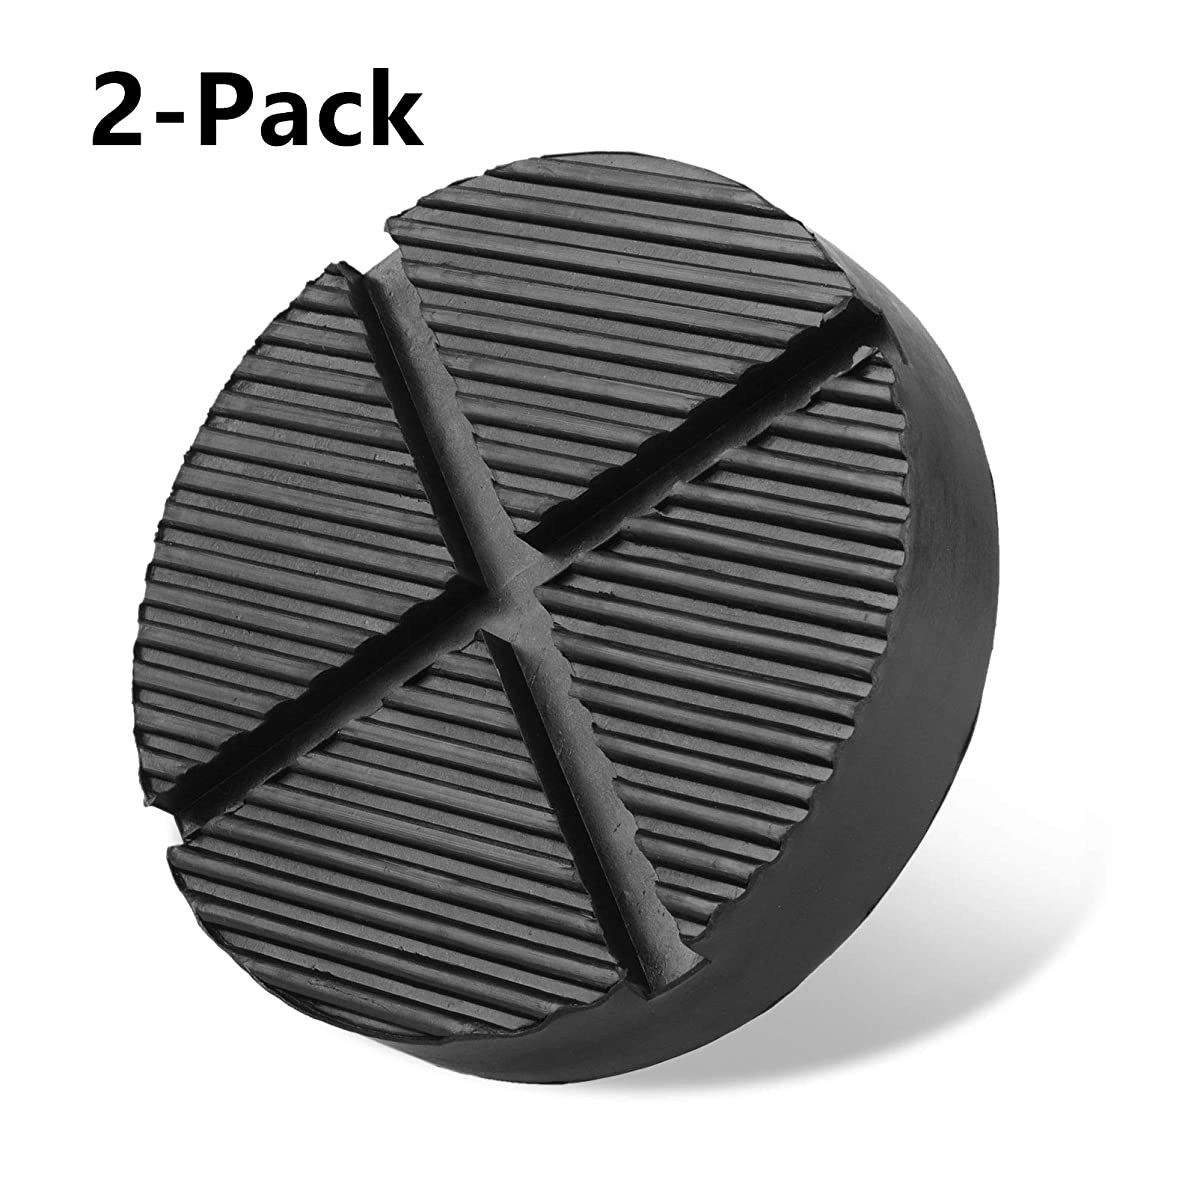 EEEKit Cross Slotted Frame Rail Floor Jack Disk Rubber Pad for Car for Pinch Weld Side Universal Jack, Black, 2-Pack